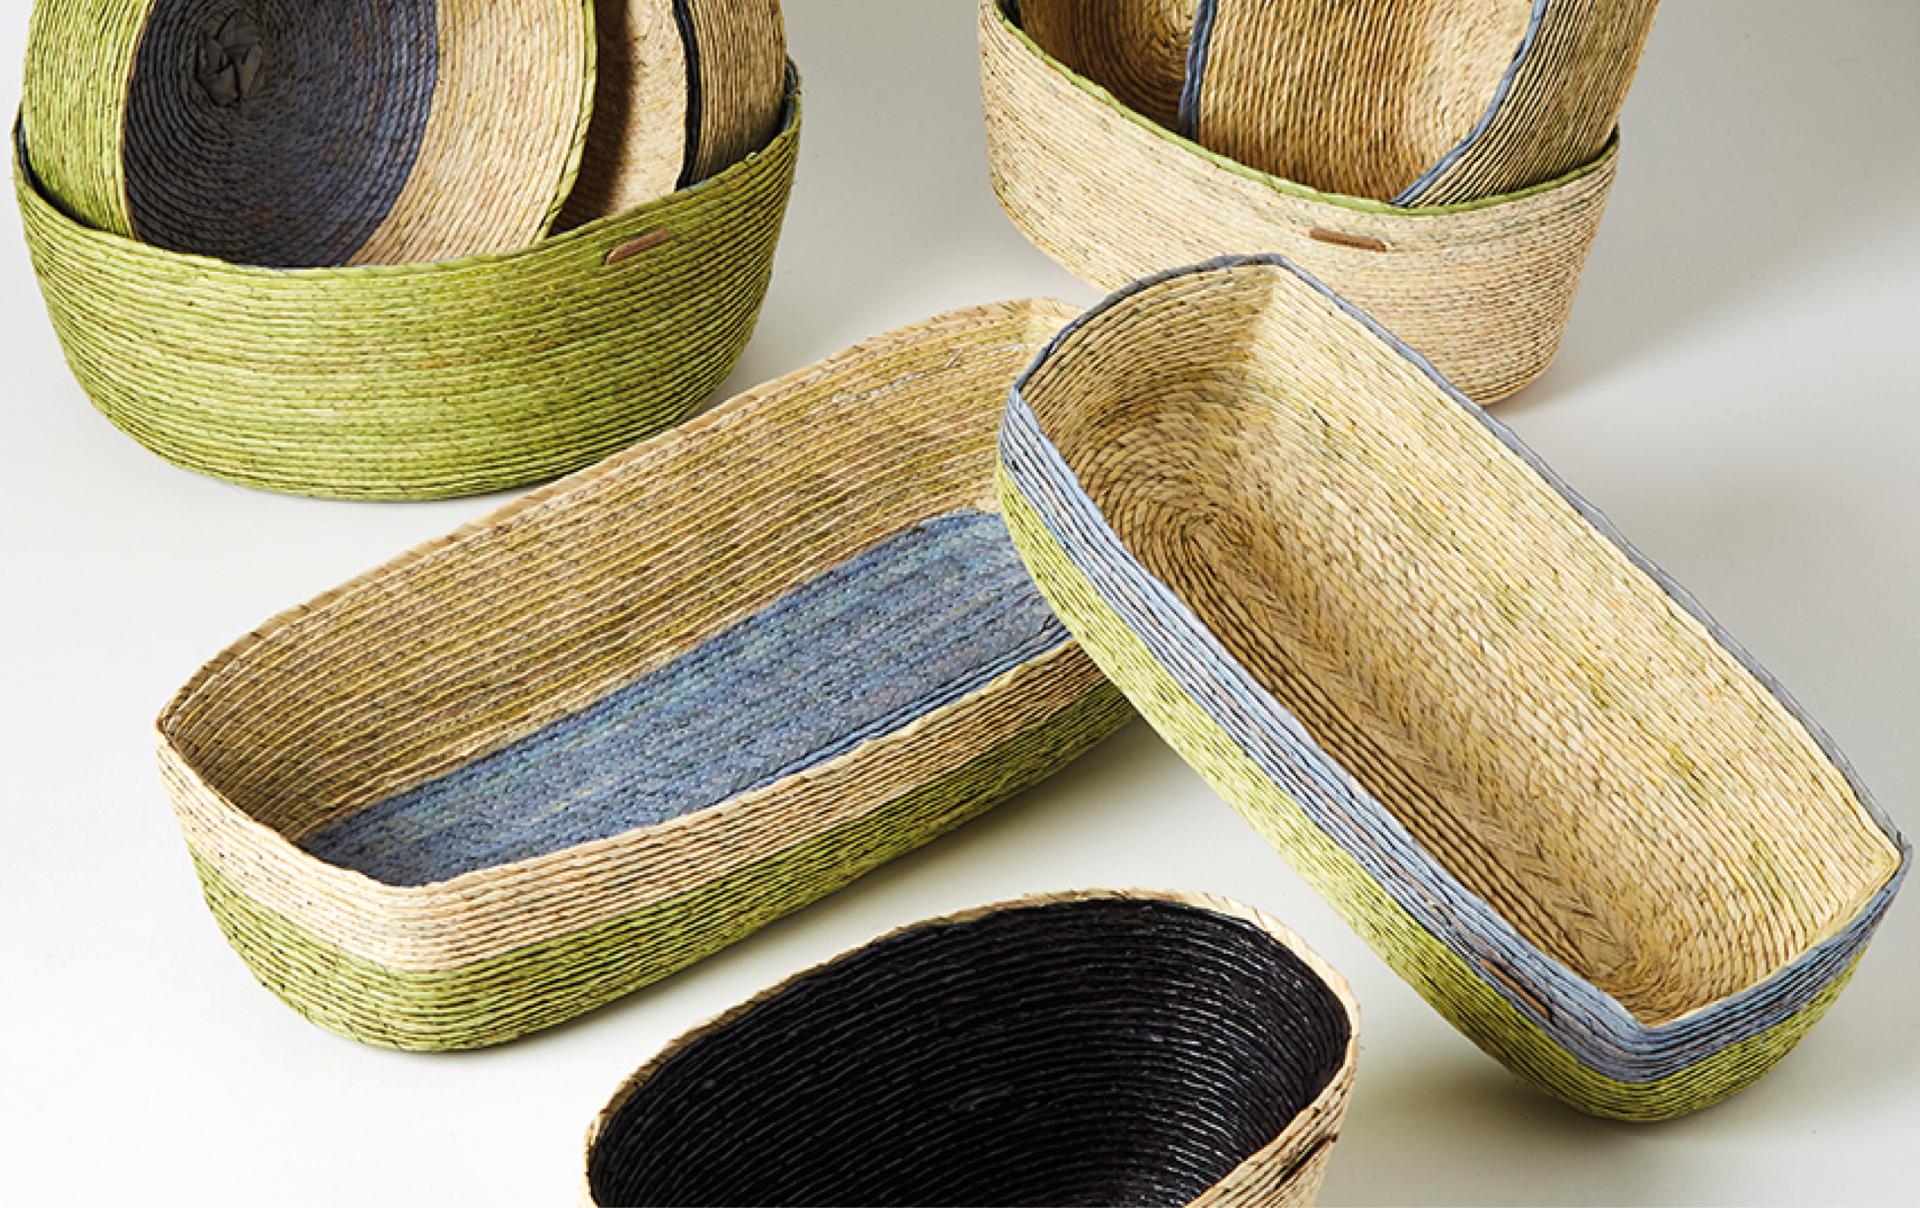 Panier oval en fibres de palmier